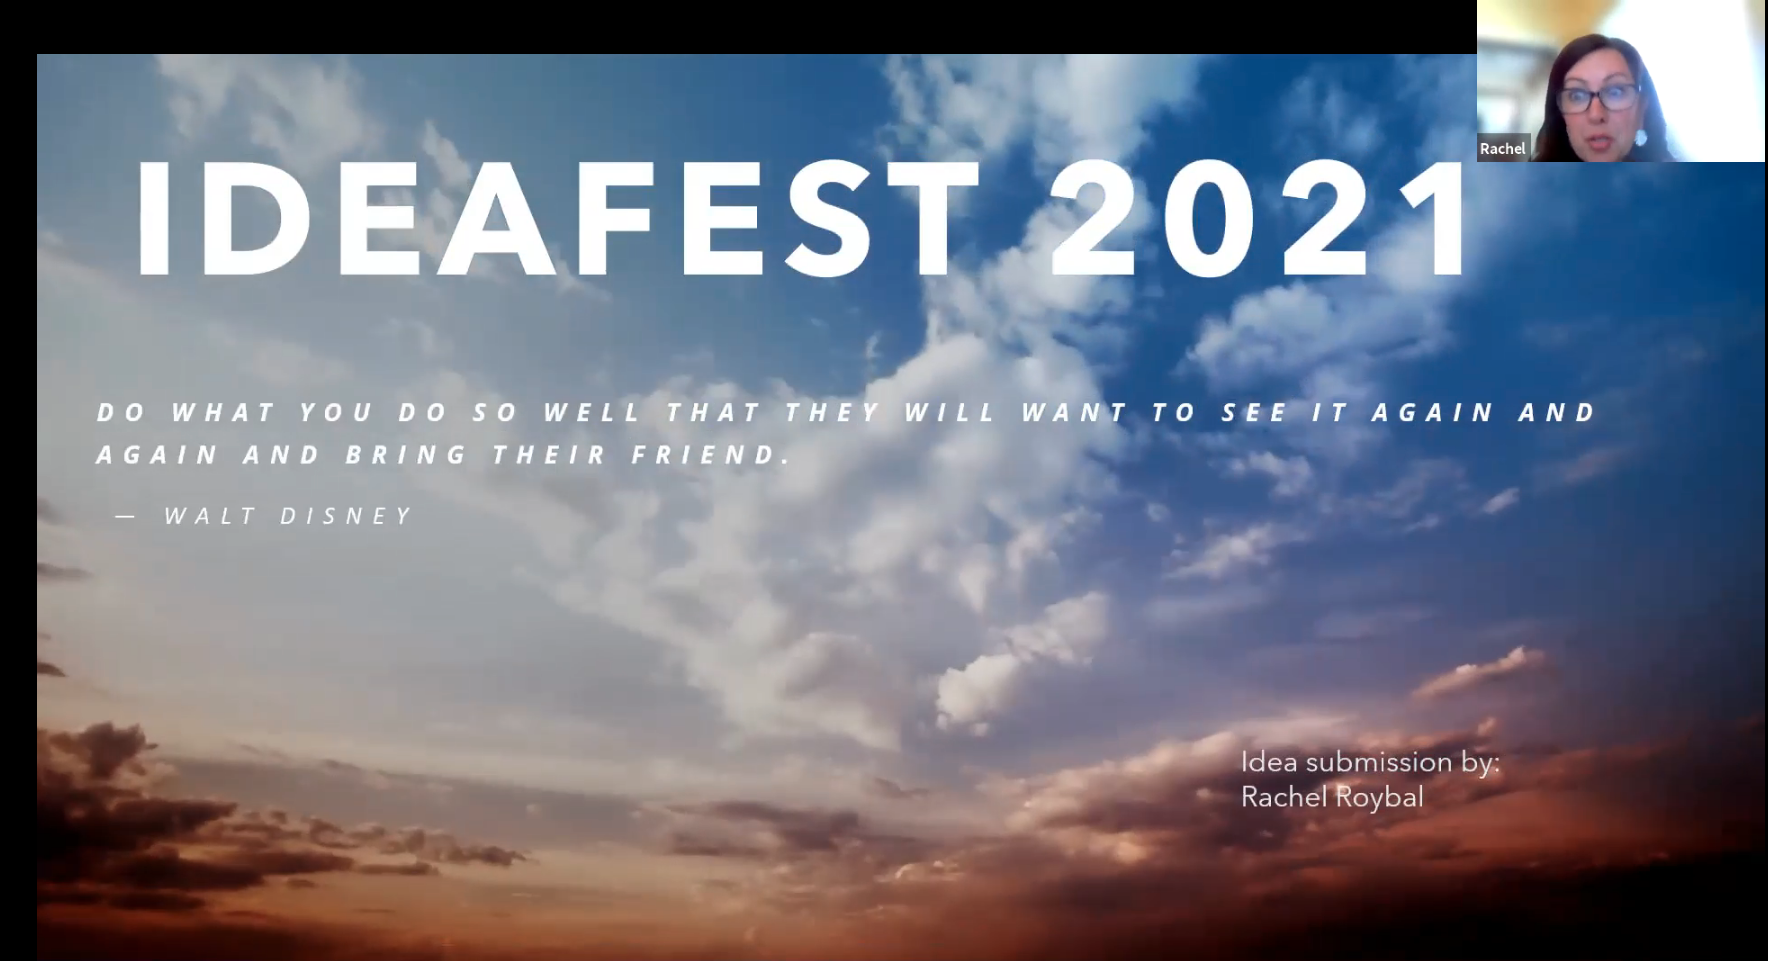 Idea Fest 2021